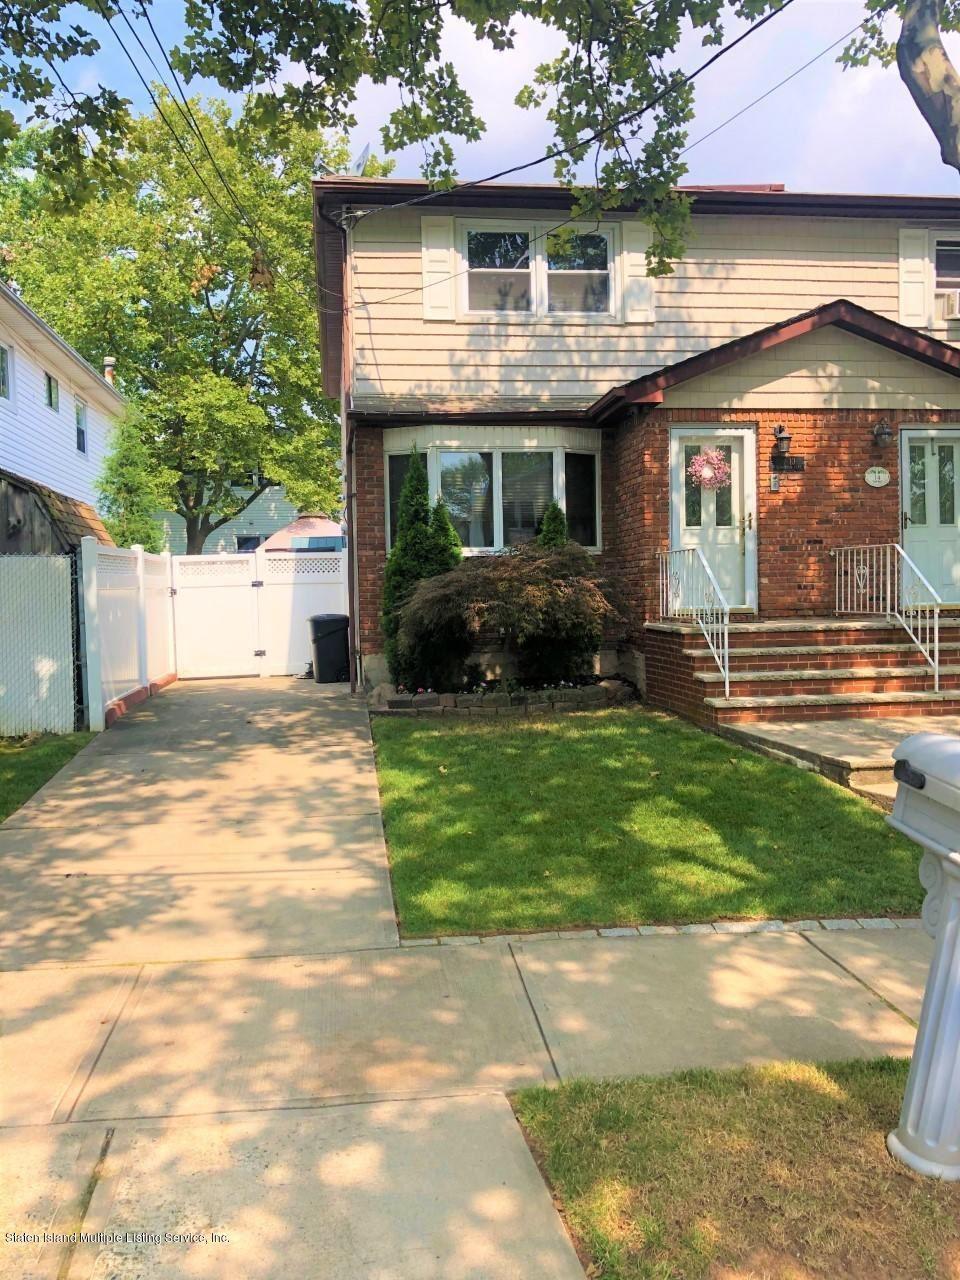 Photo for 10 Willowwood Lane, Staten Island, NY 10308 (MLS # 1139929)